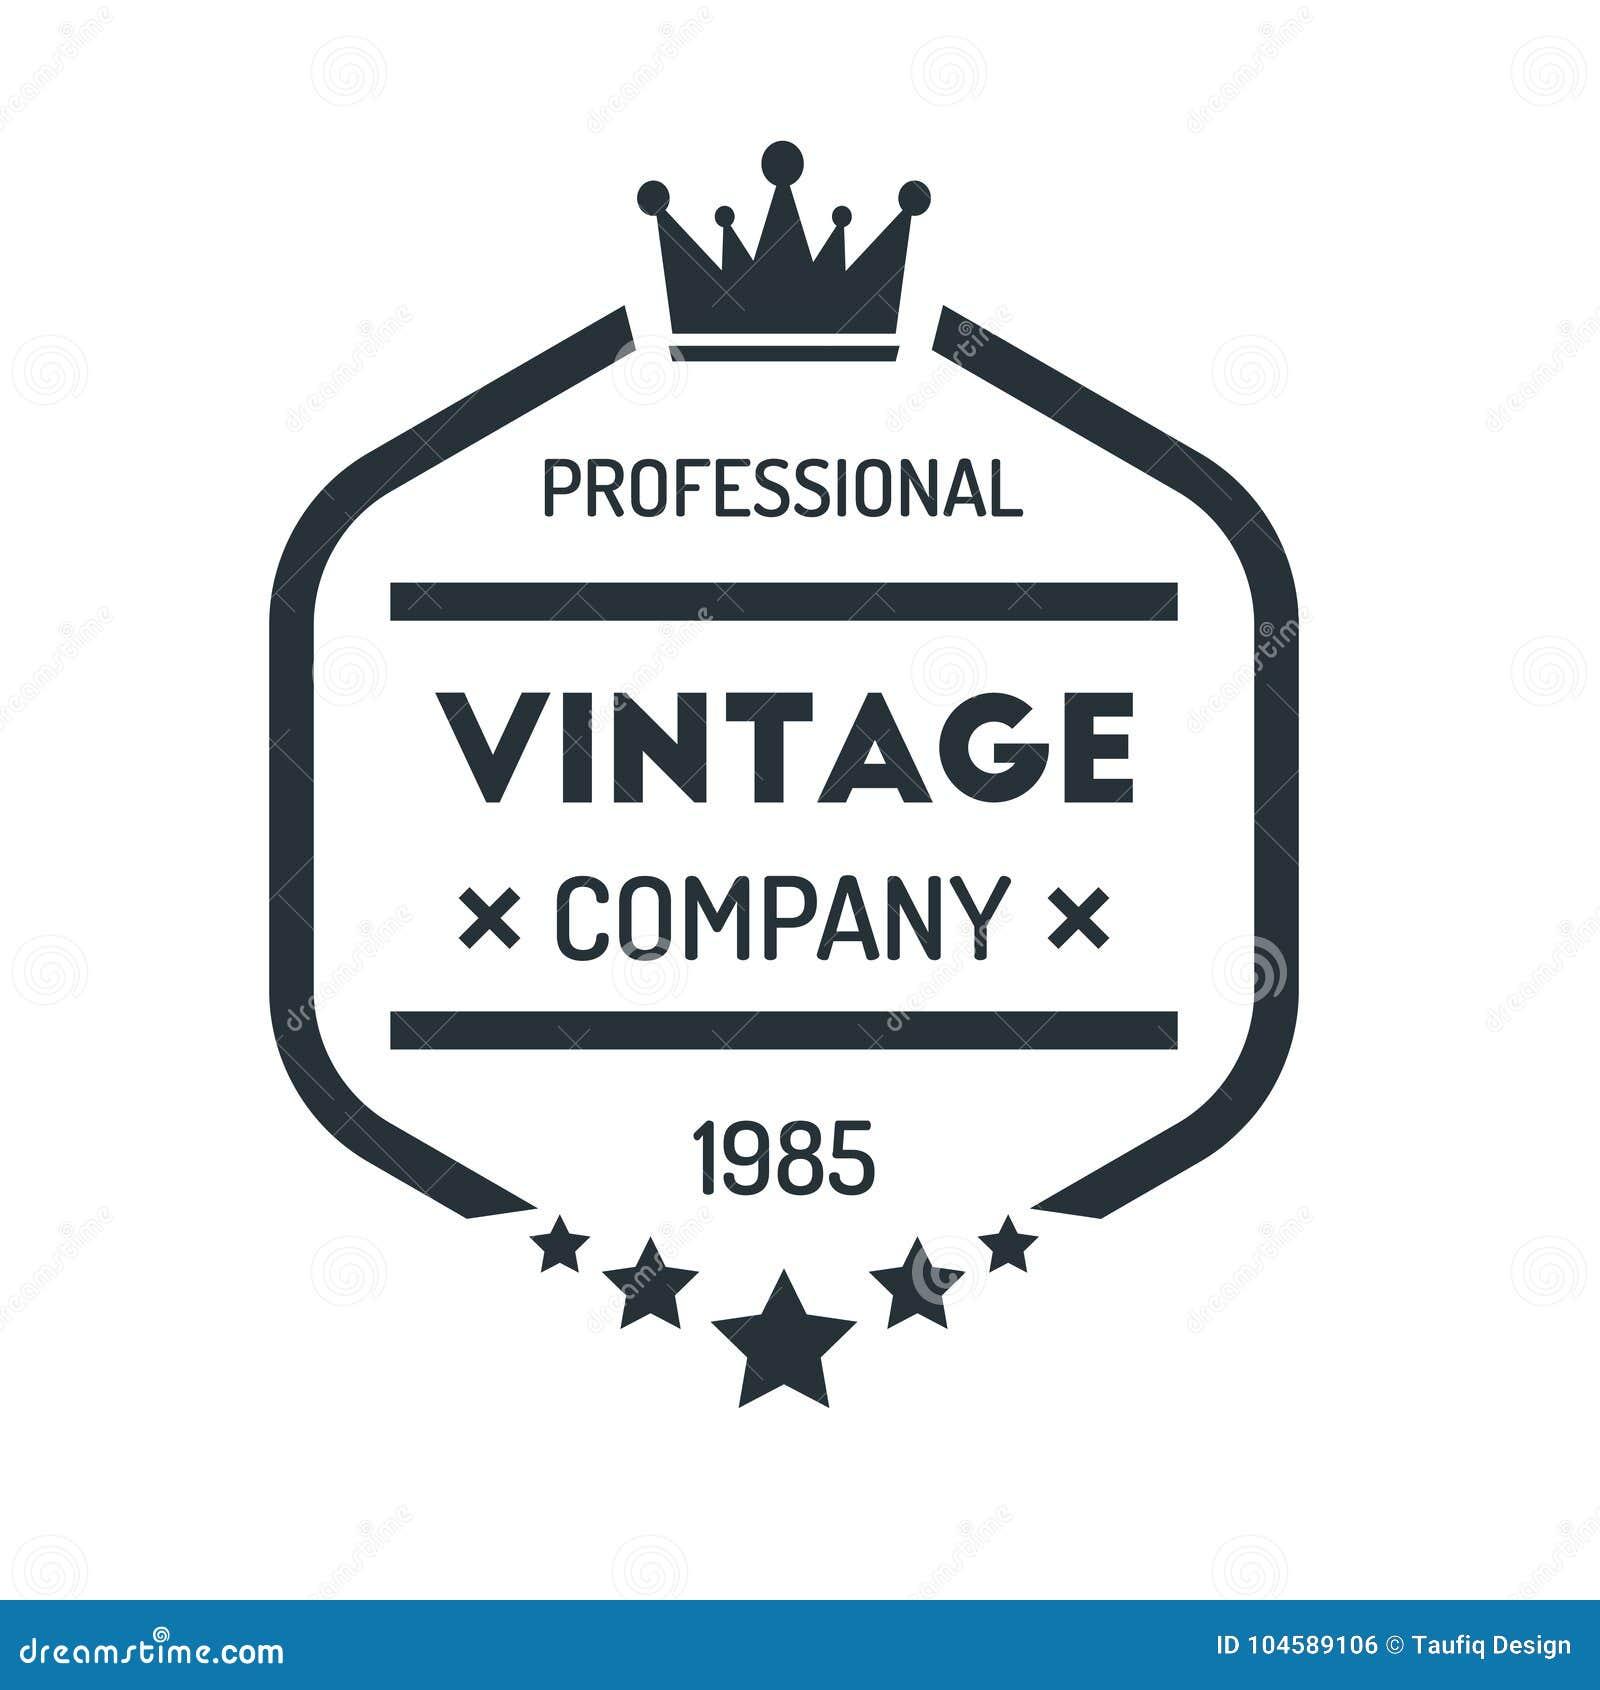 Hexagon vintage hipster badge logo design template vector symbol download hexagon vintage hipster badge logo design template vector symbol stock vector illustration of badge maxwellsz